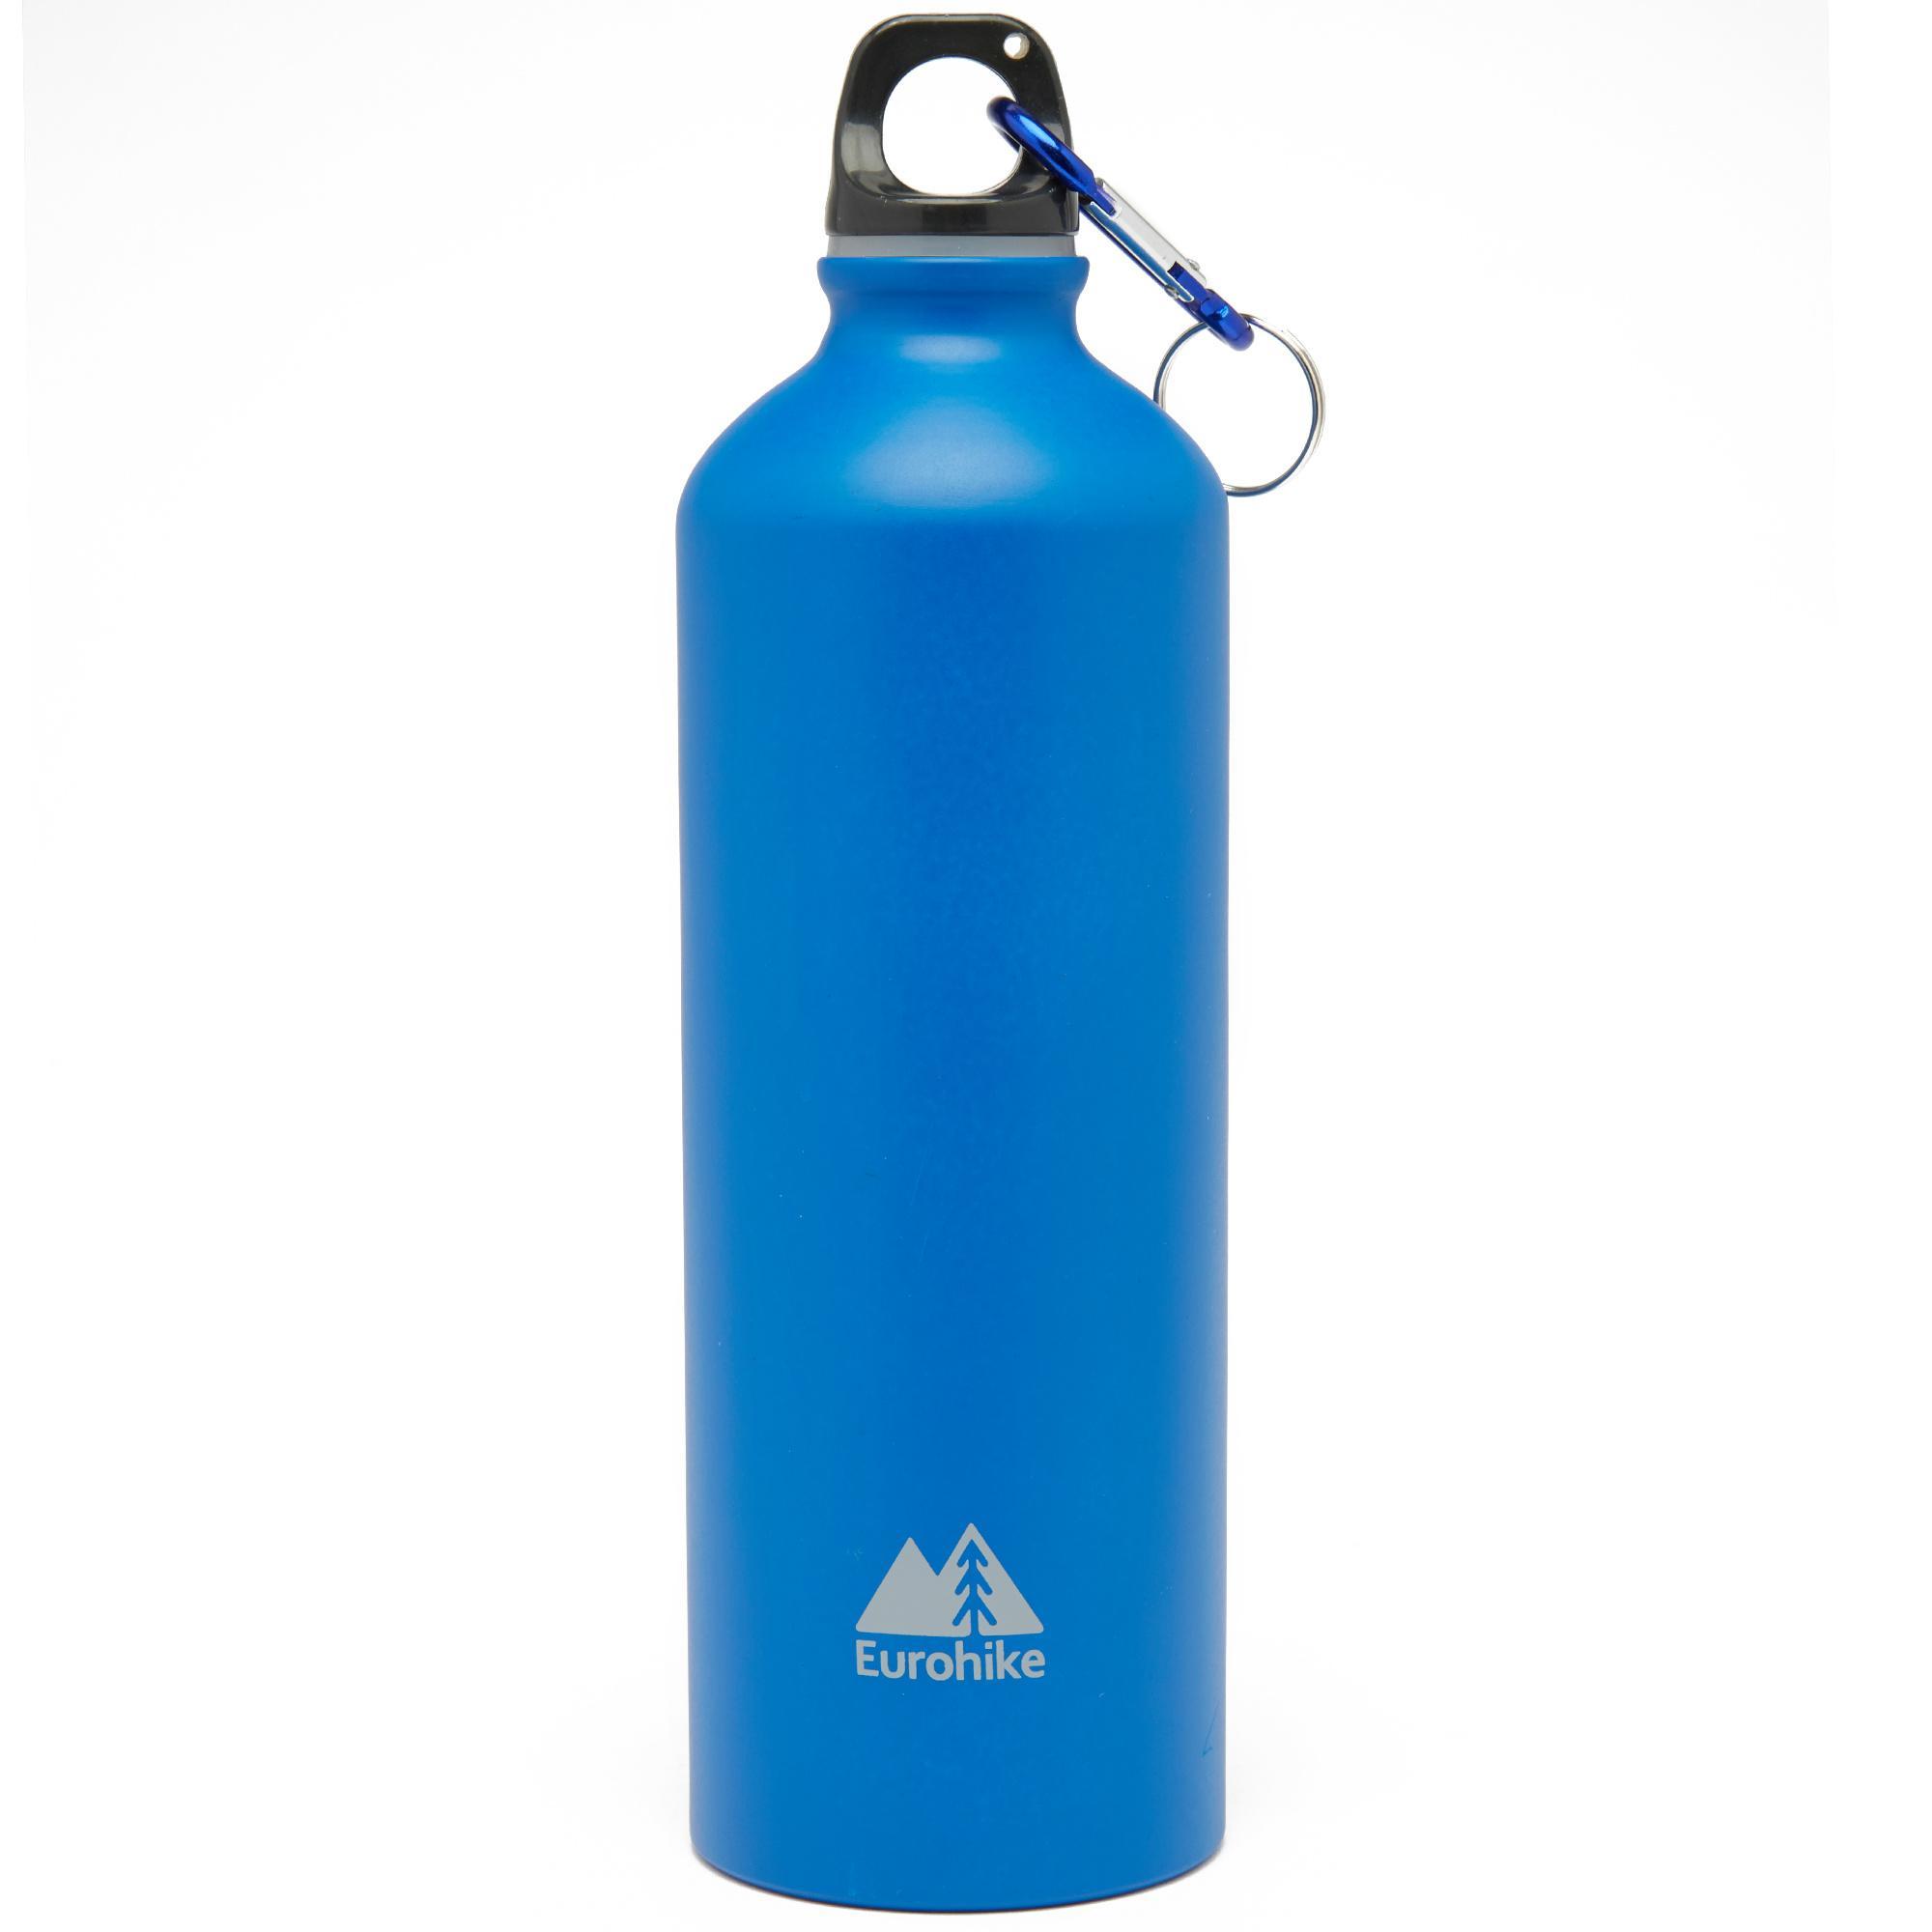 Eurohike Aqua 0.75L Aluminium Bottle, Blue/BLUE